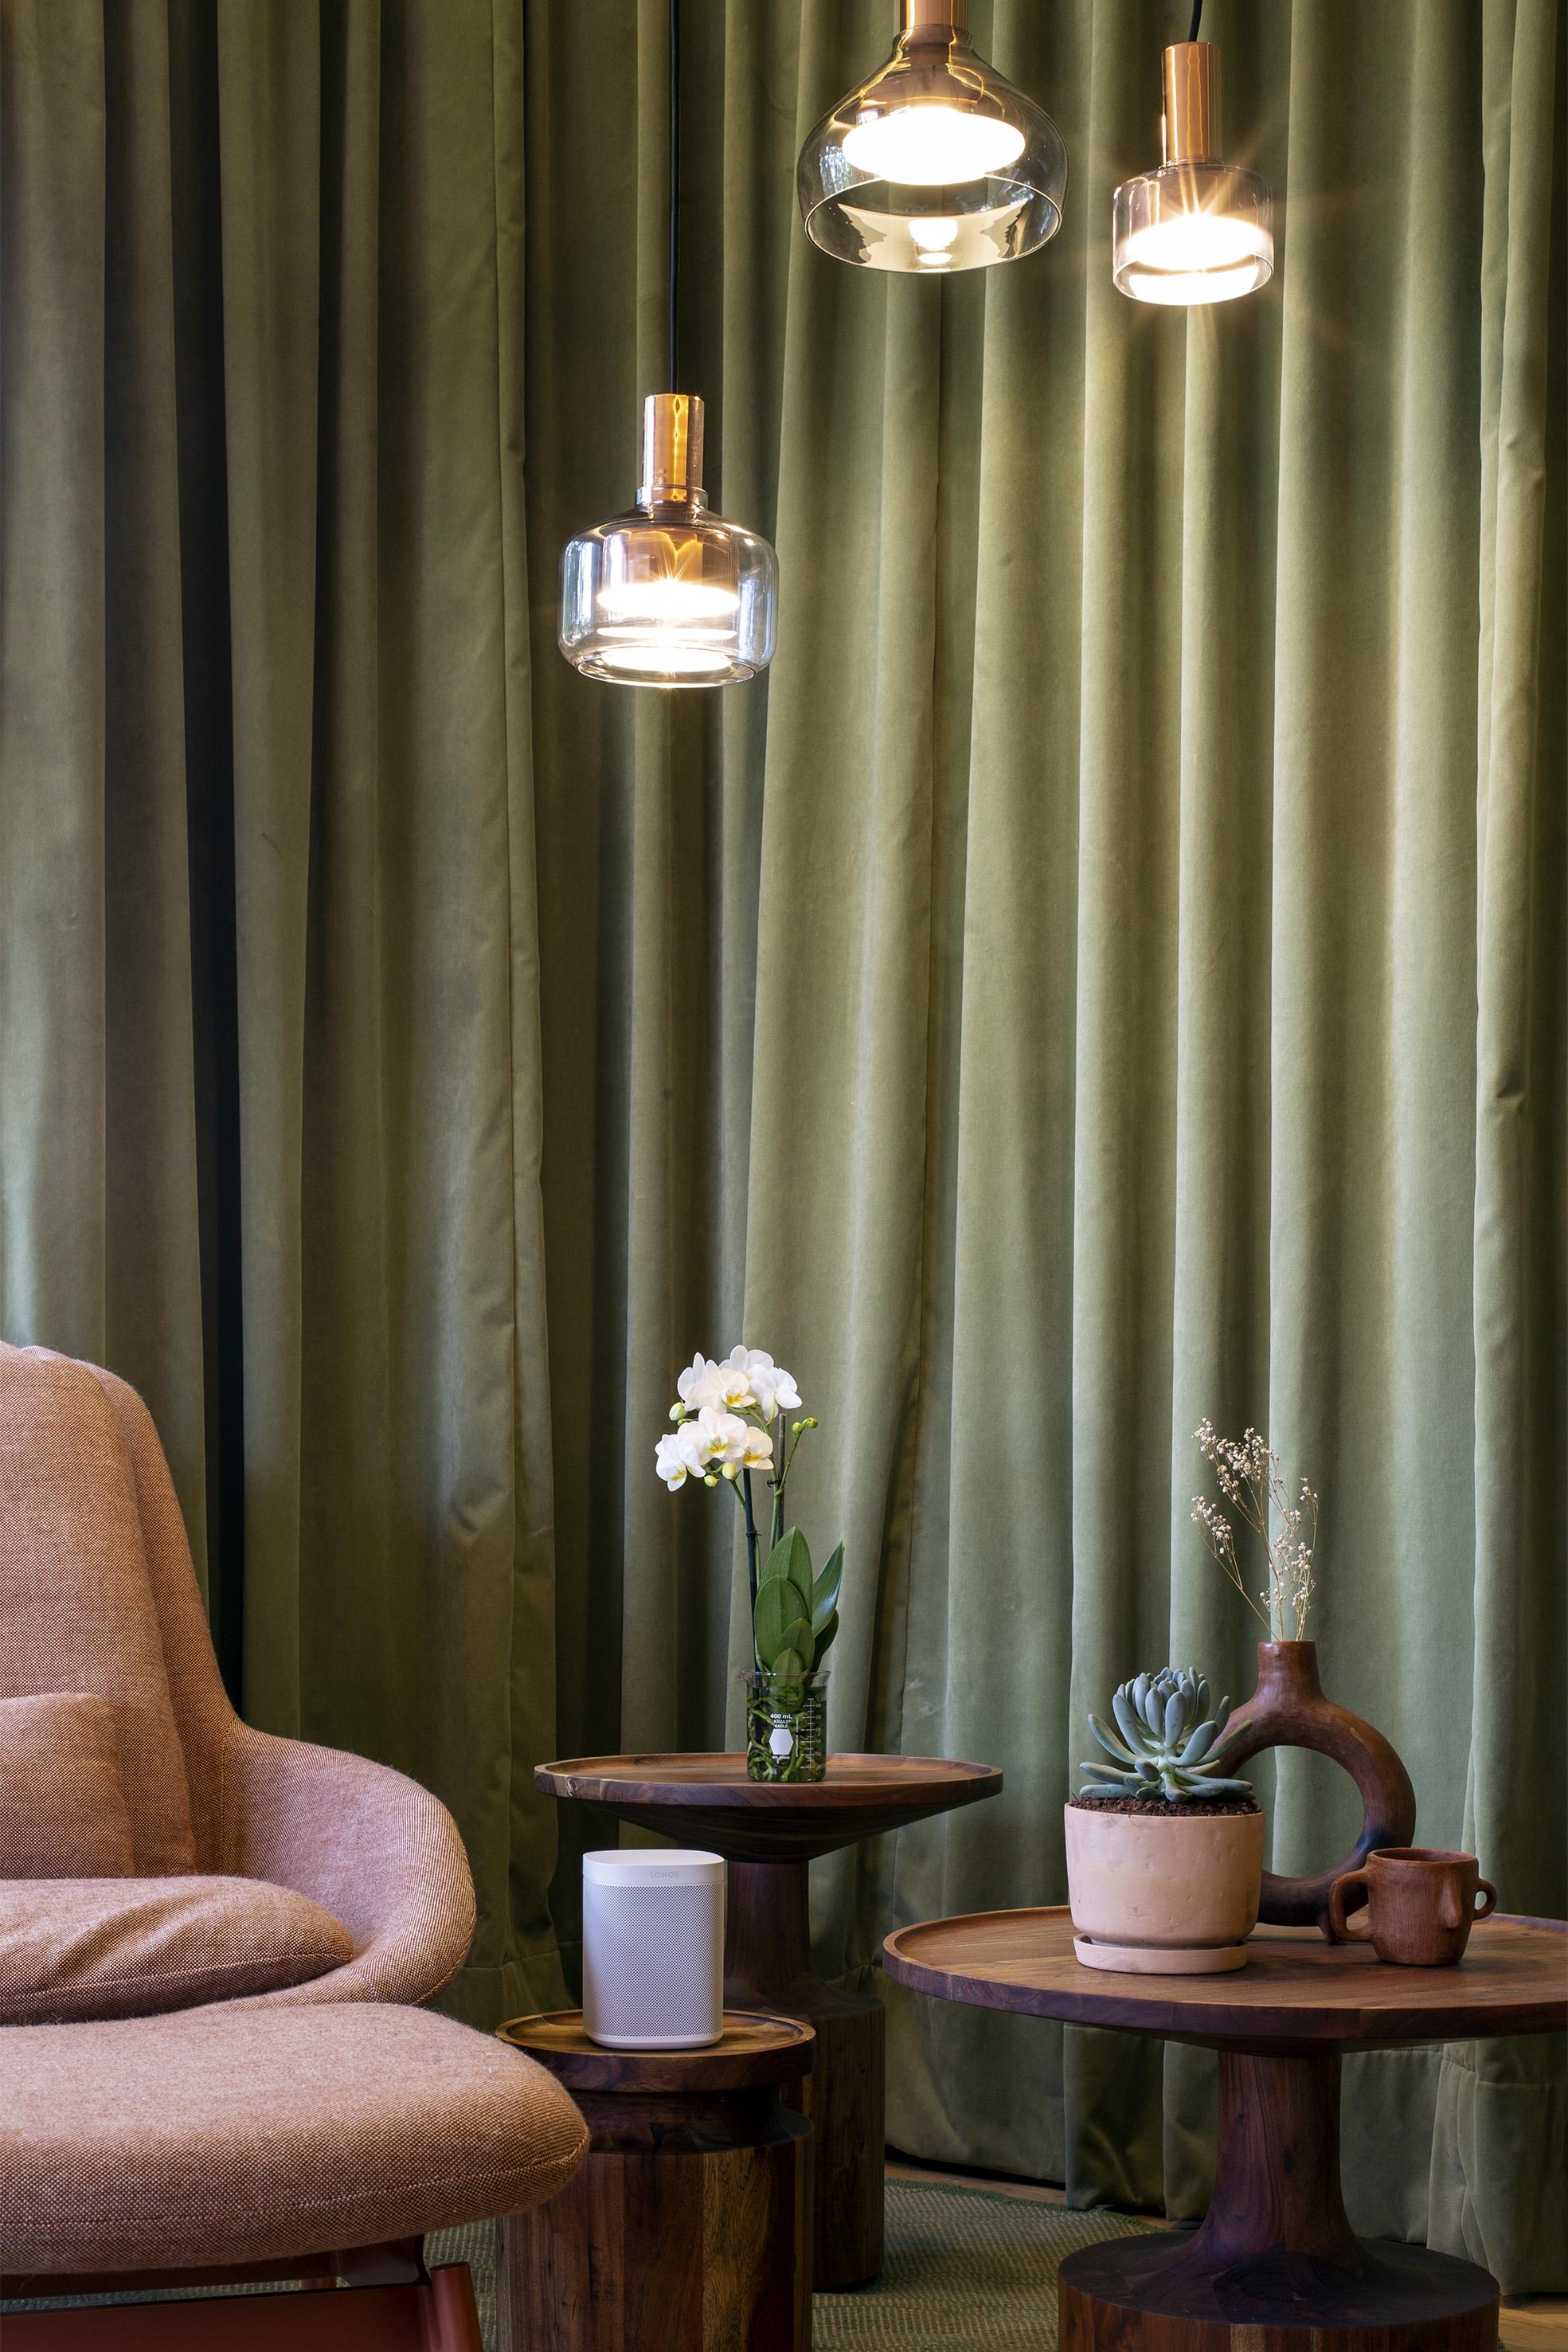 One_White-Lifestyle-Living_Room-Q4FY20_MST-MST_JPEG_fid113147